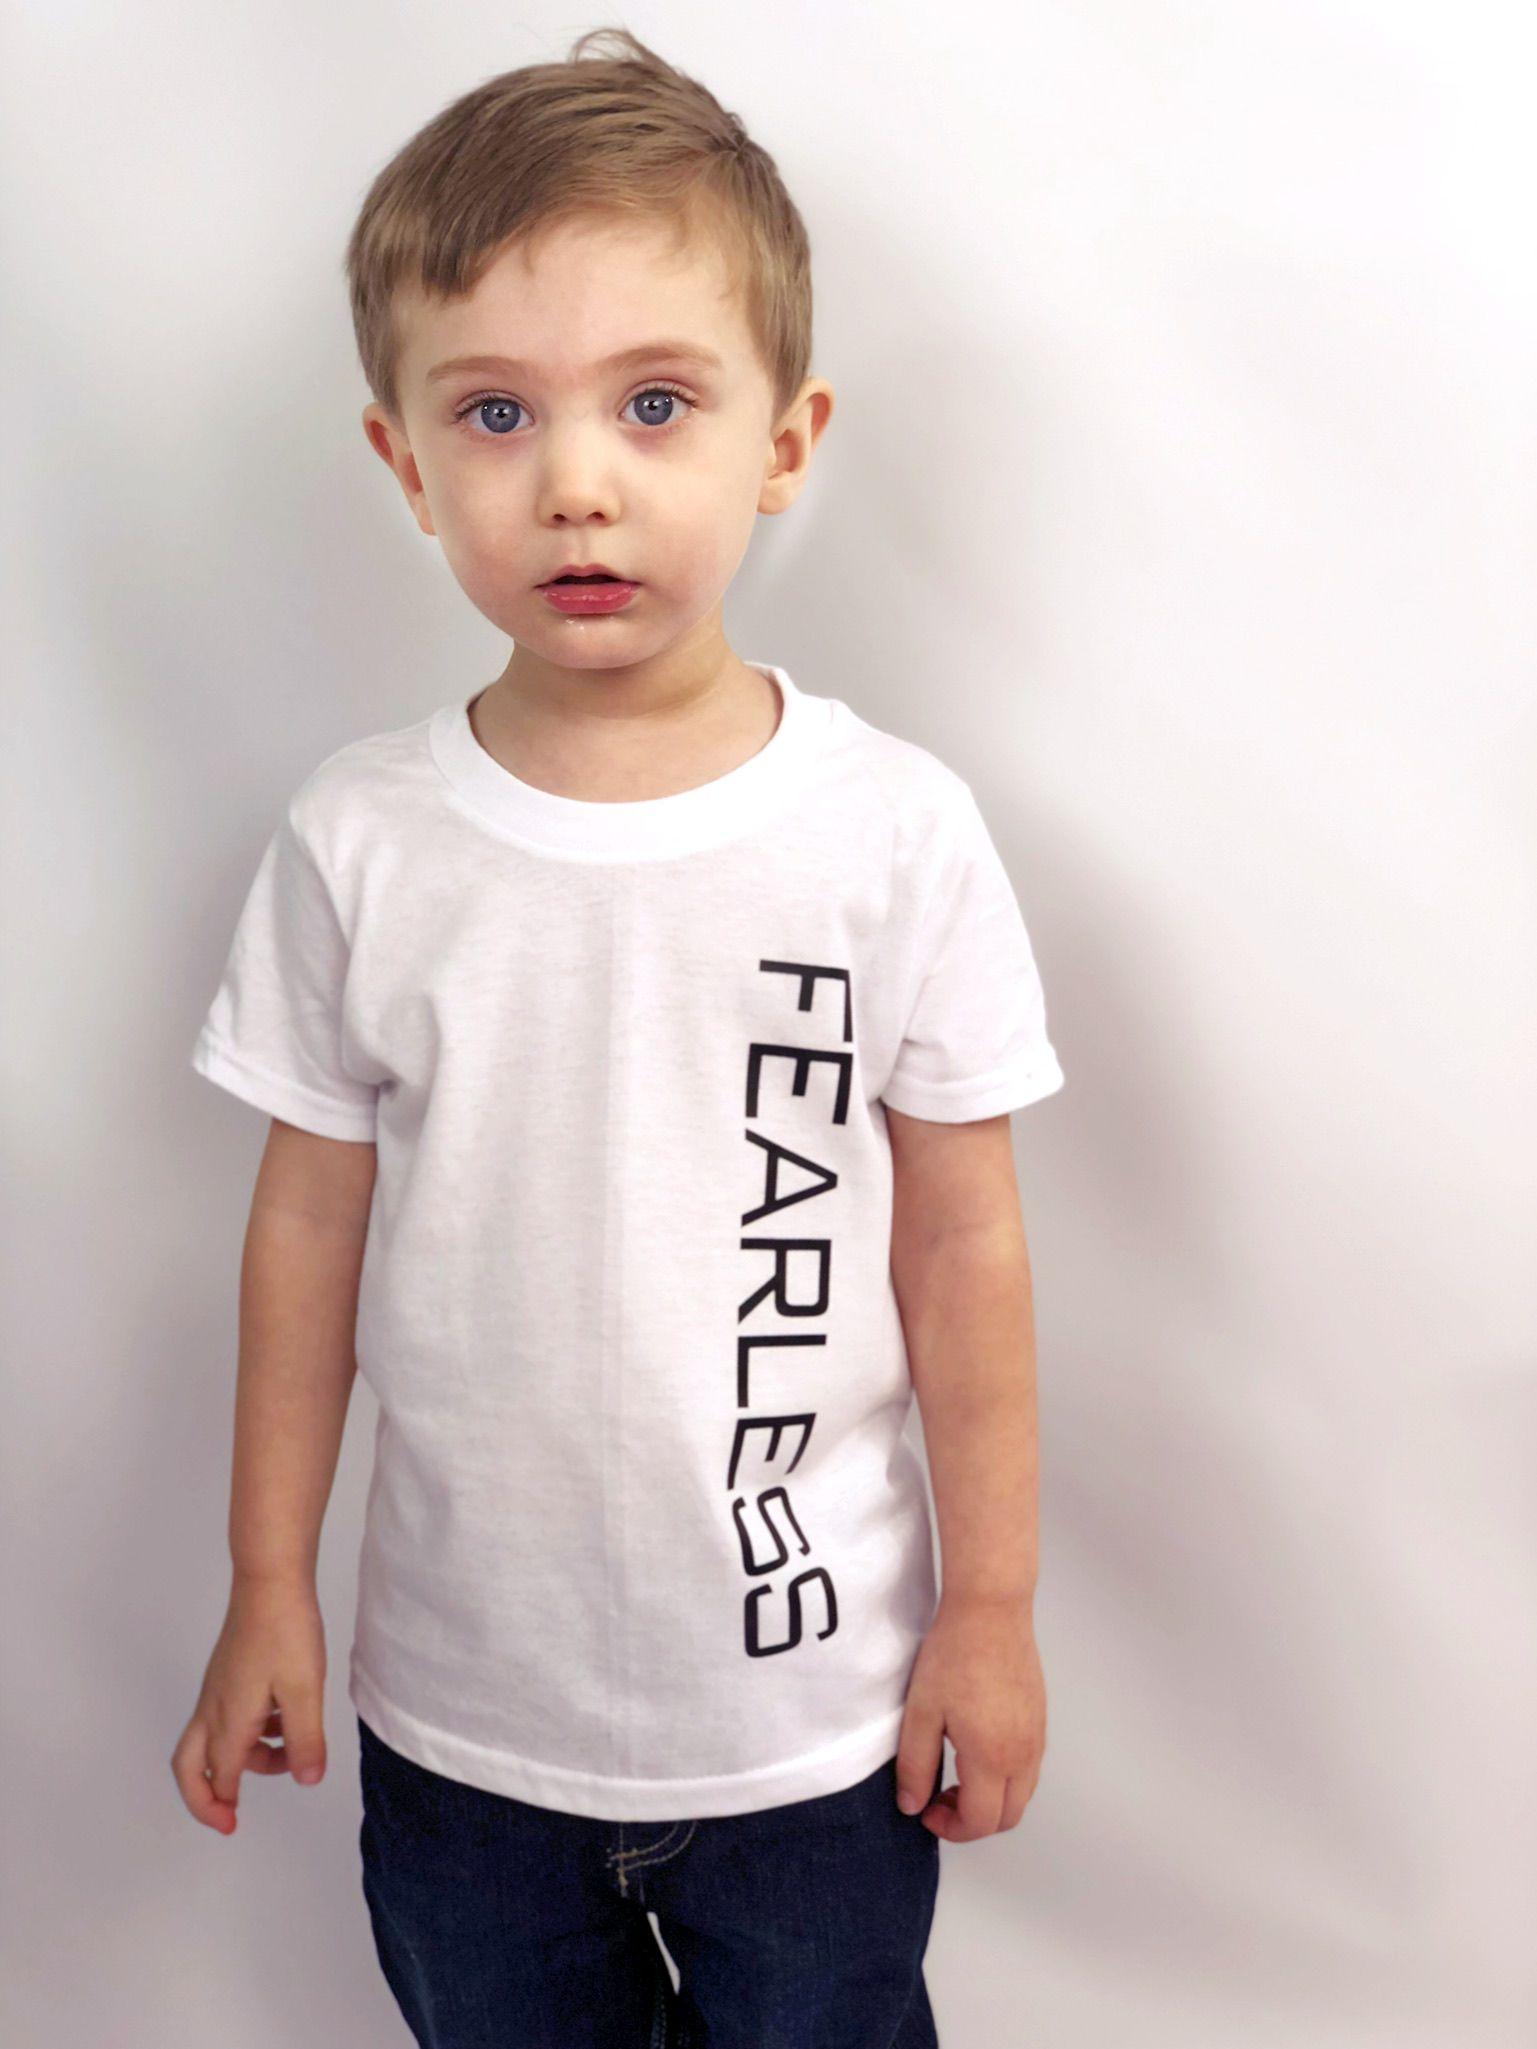 boy girl tee toddler fearless strong tshirt